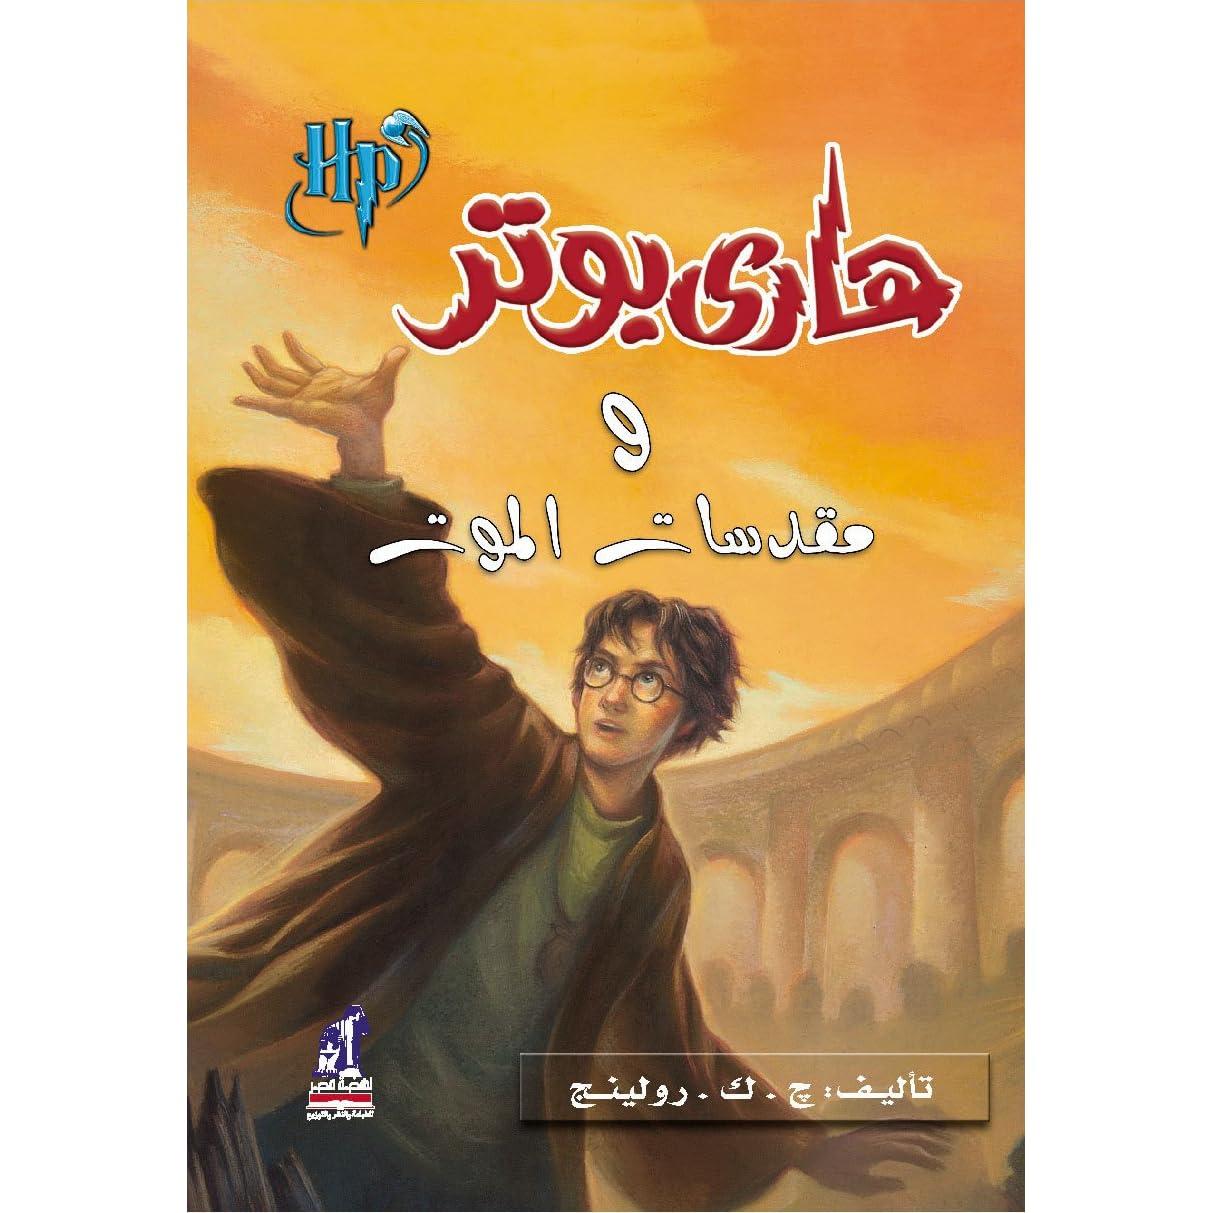 Mohammed Arabey S Review Of هاري بوتر ومقدسات الموت